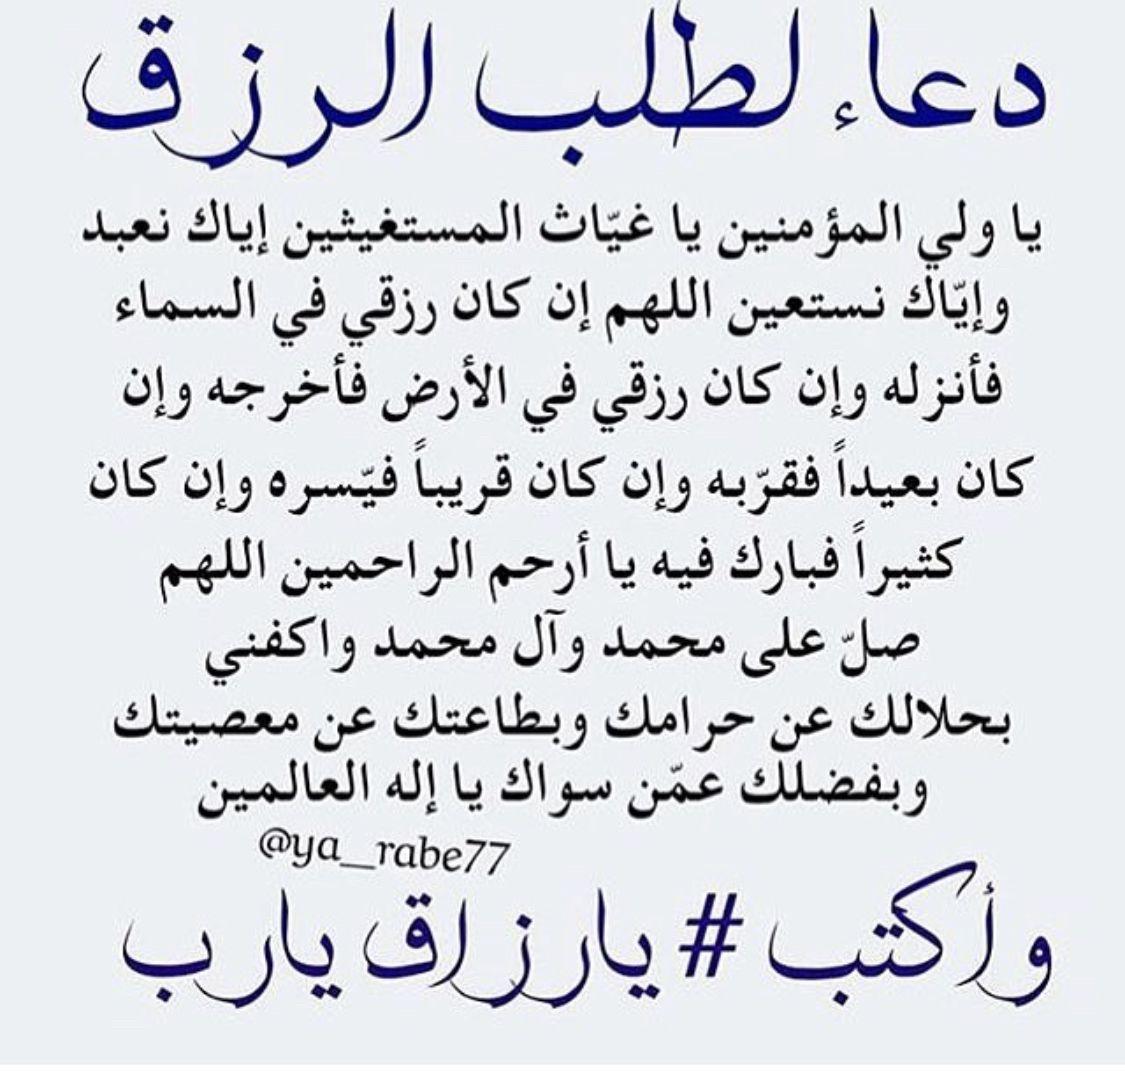 يا رزاق يارب Quran Quotes Inspirational Islamic Phrases Quran Quotes